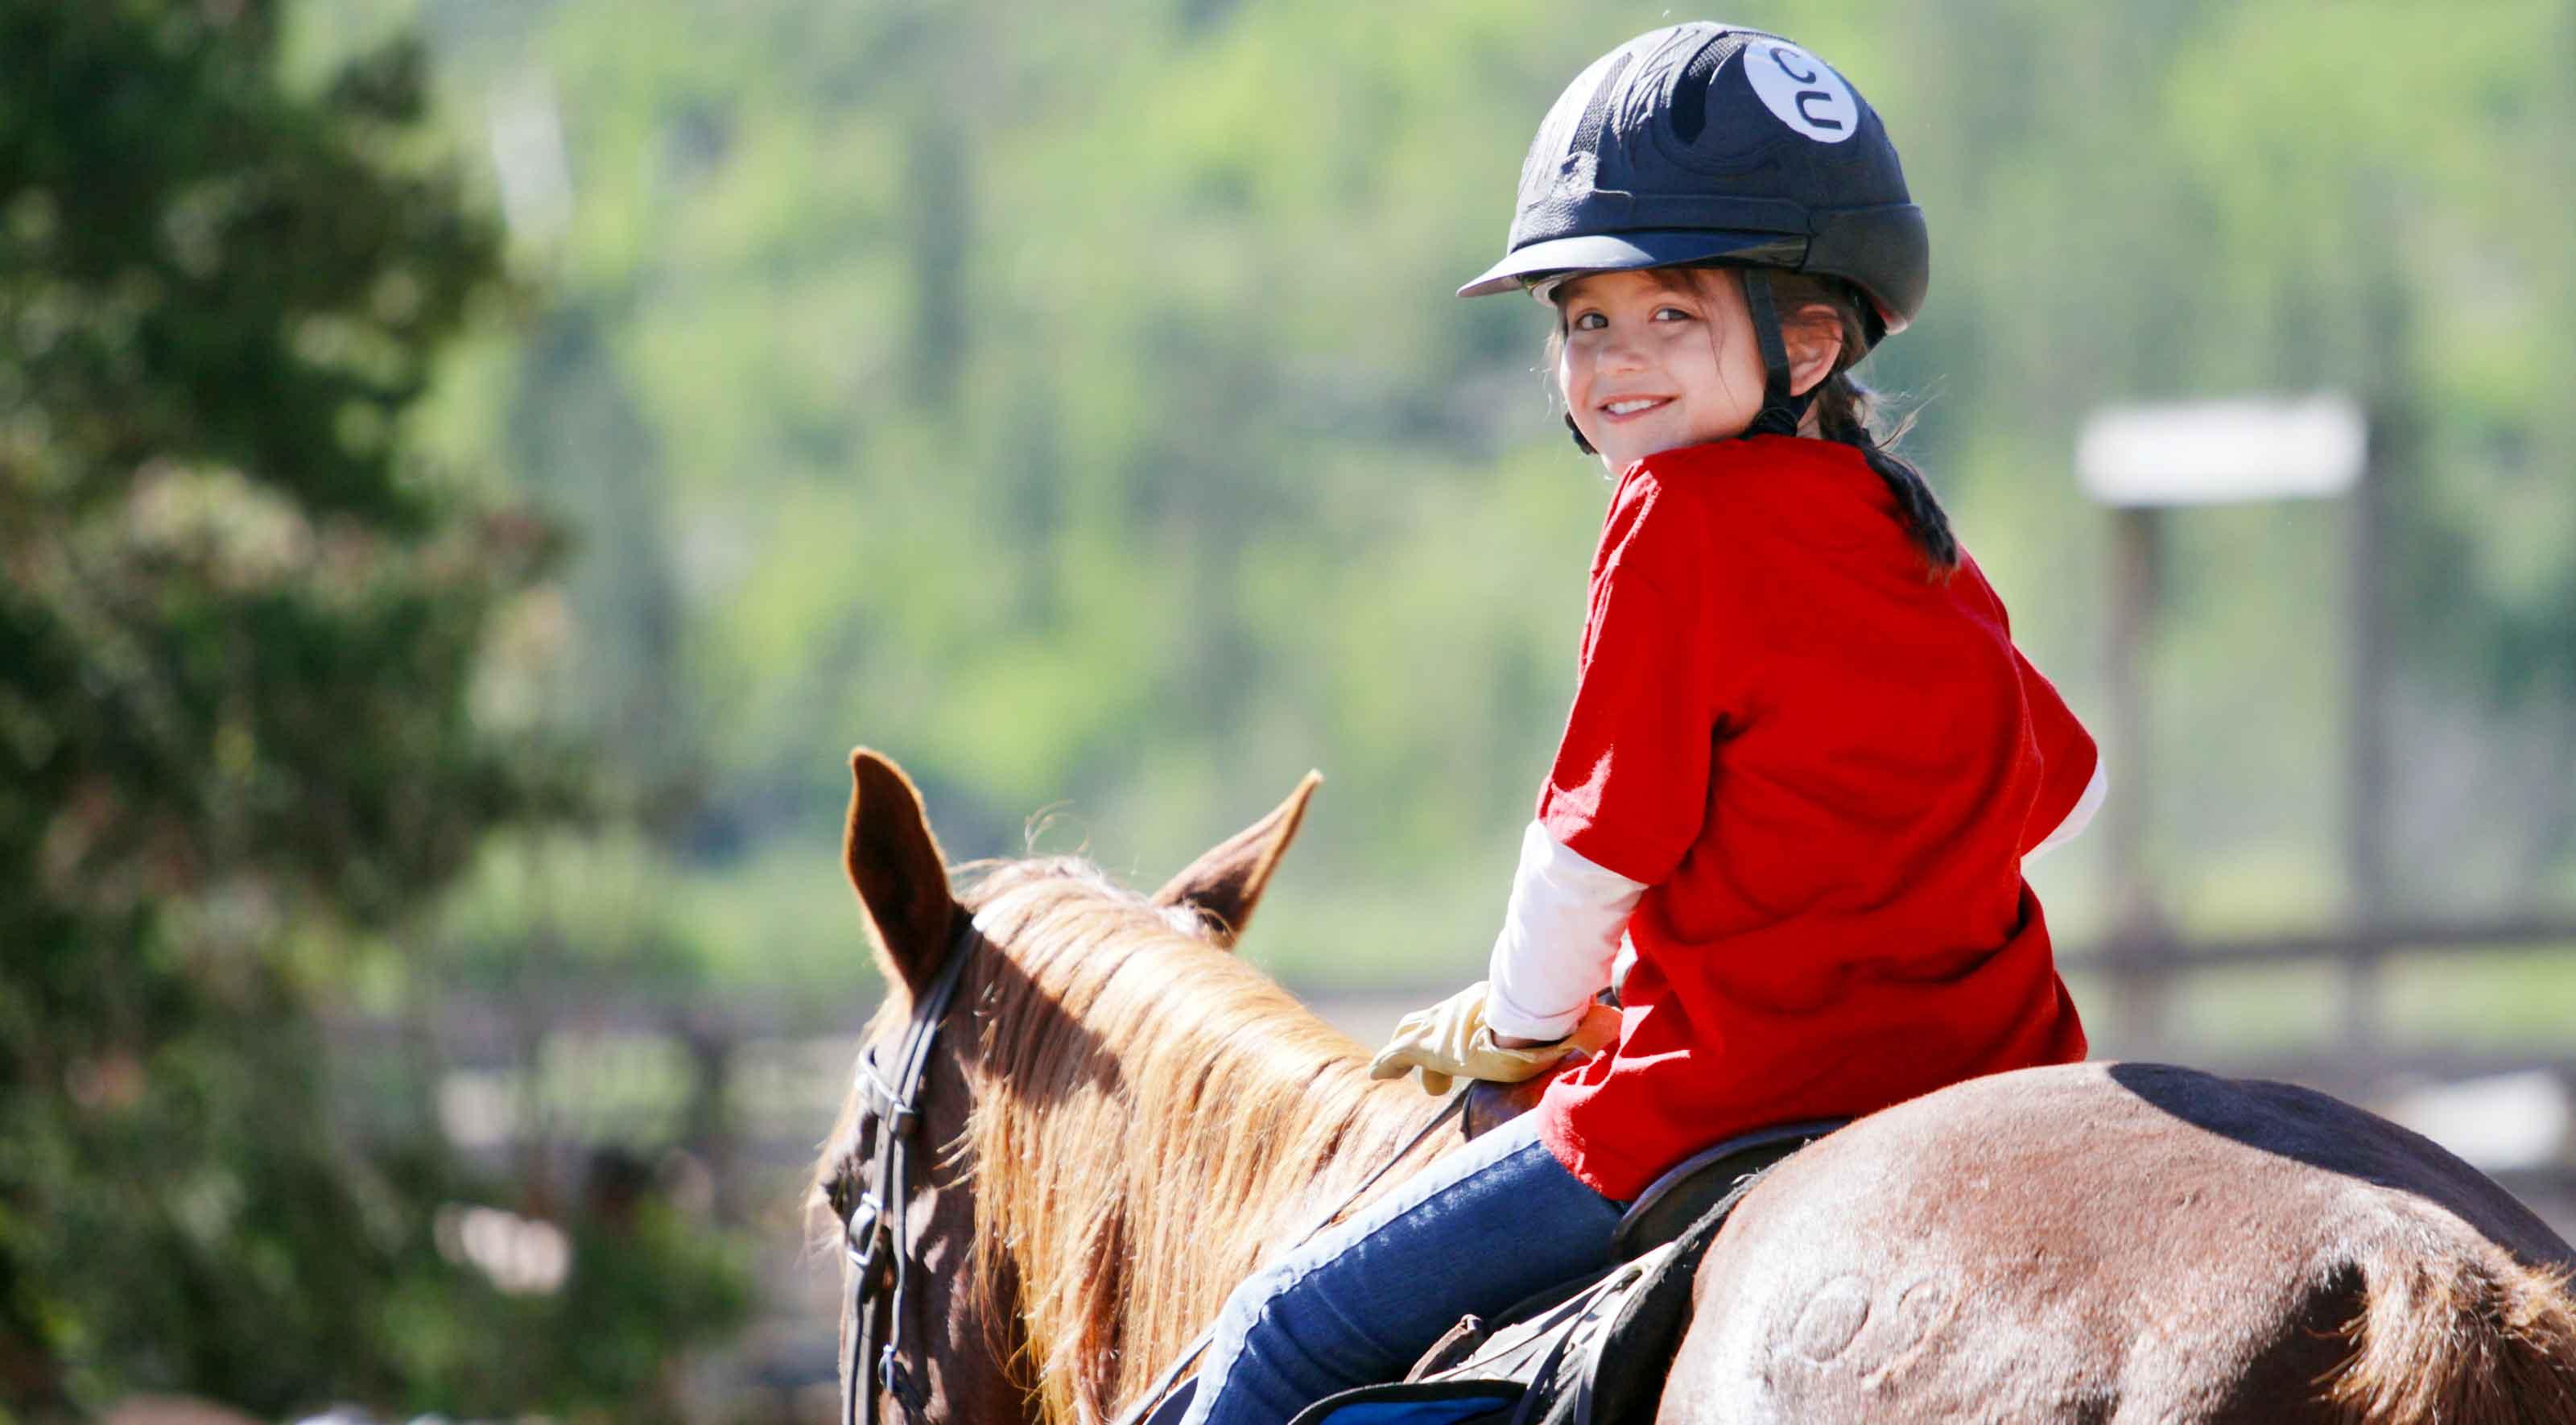 Free photo: Kid riding horse - Brown, Capgomeh, Carnival - Free Download -  Jooinn